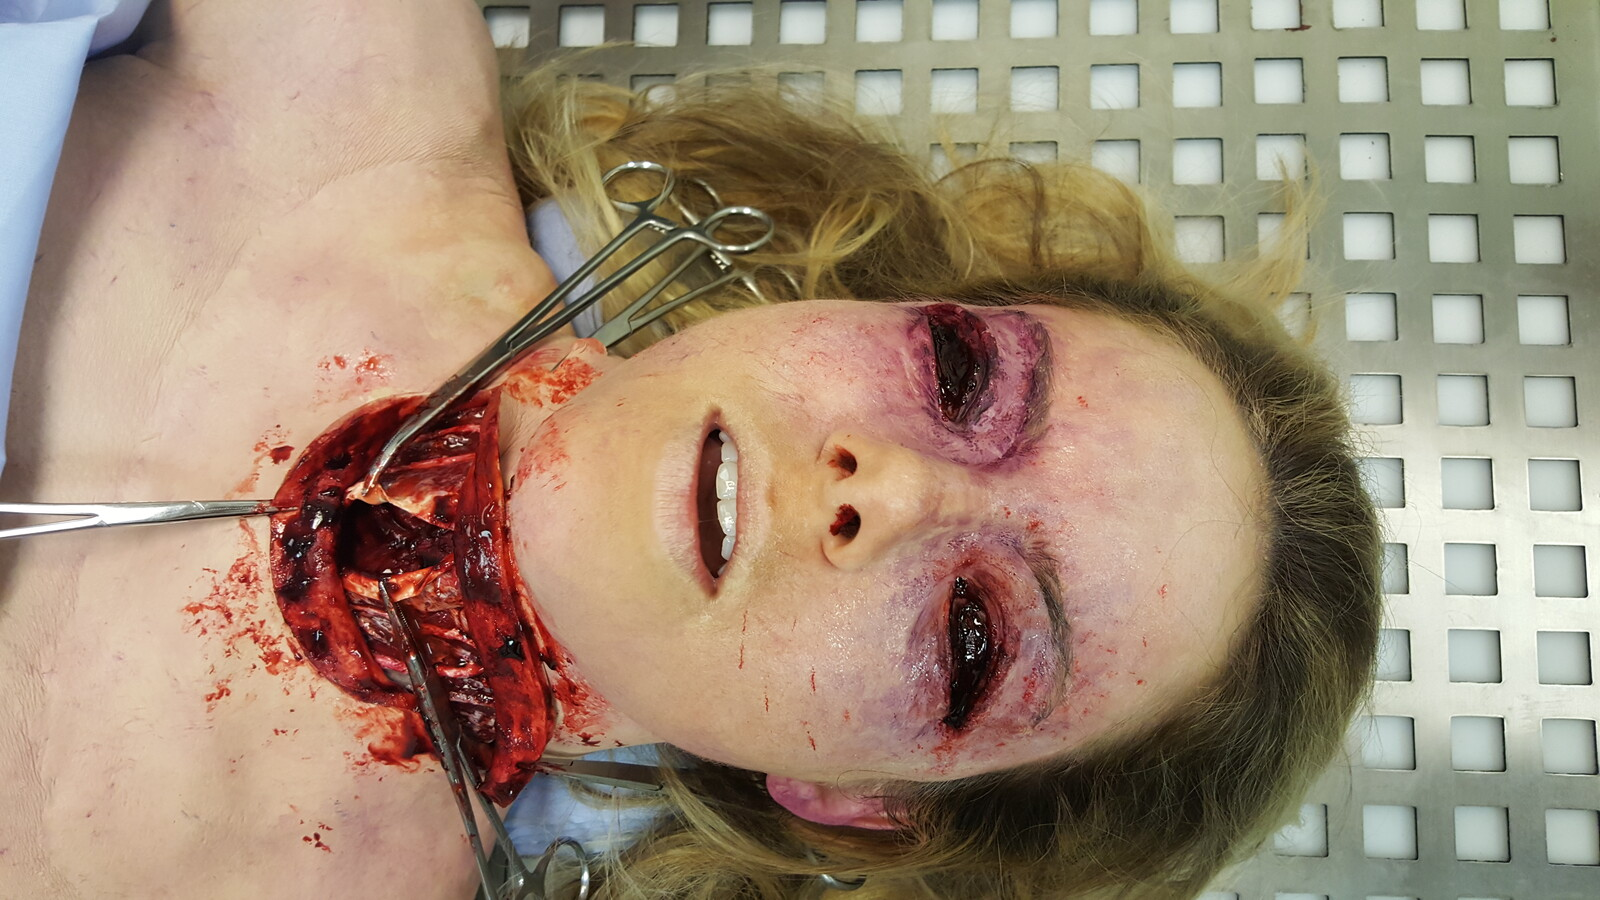 Eyeless Horror Surgery Make-up